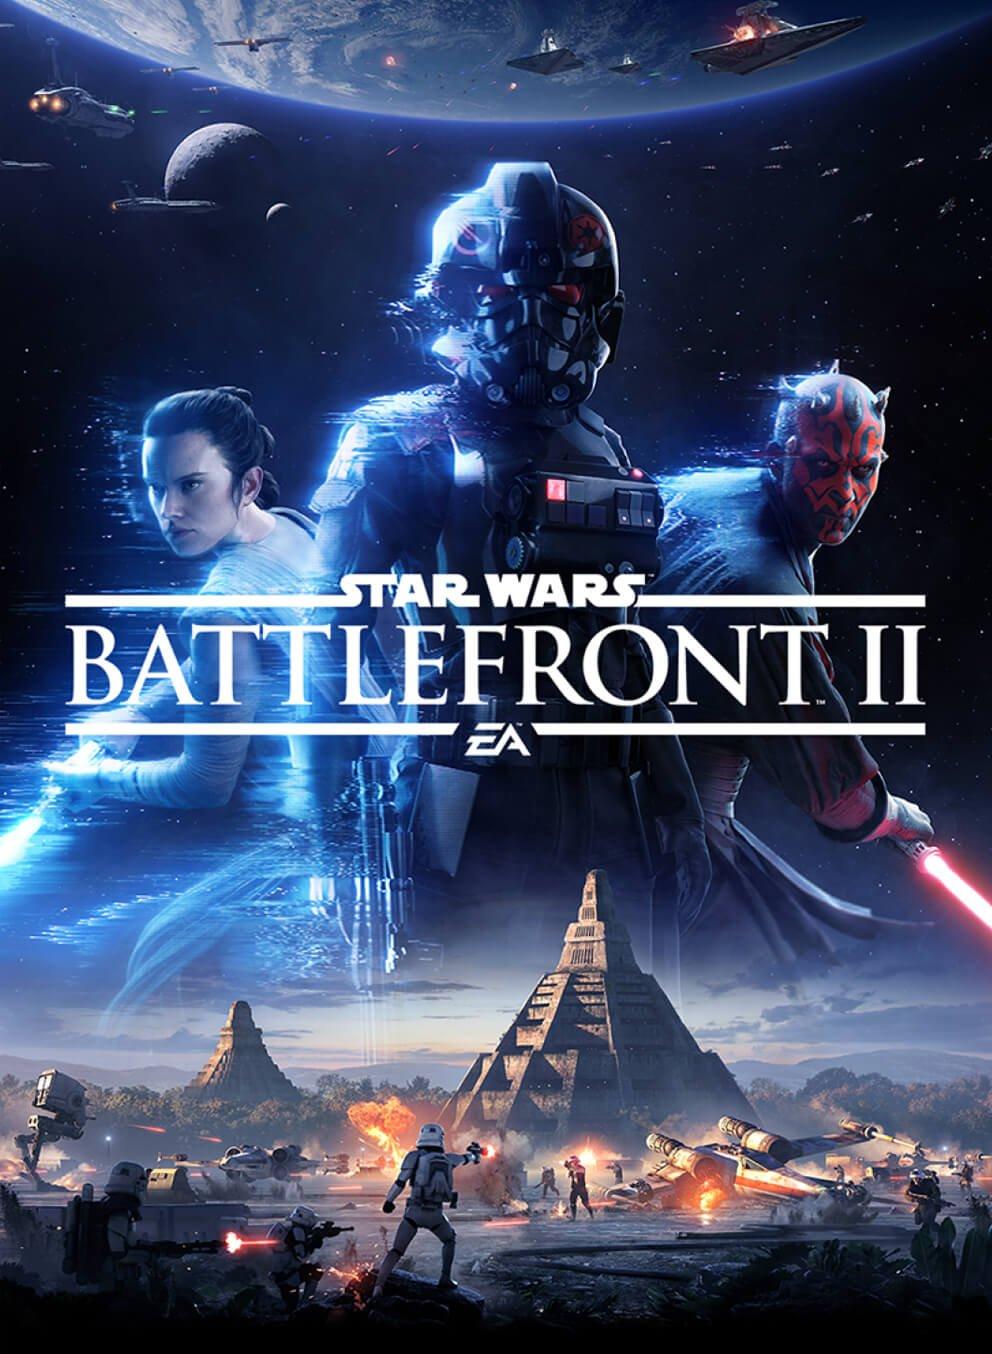 280,00 TL Değerinde STAR WARS™ Battlefront™ II